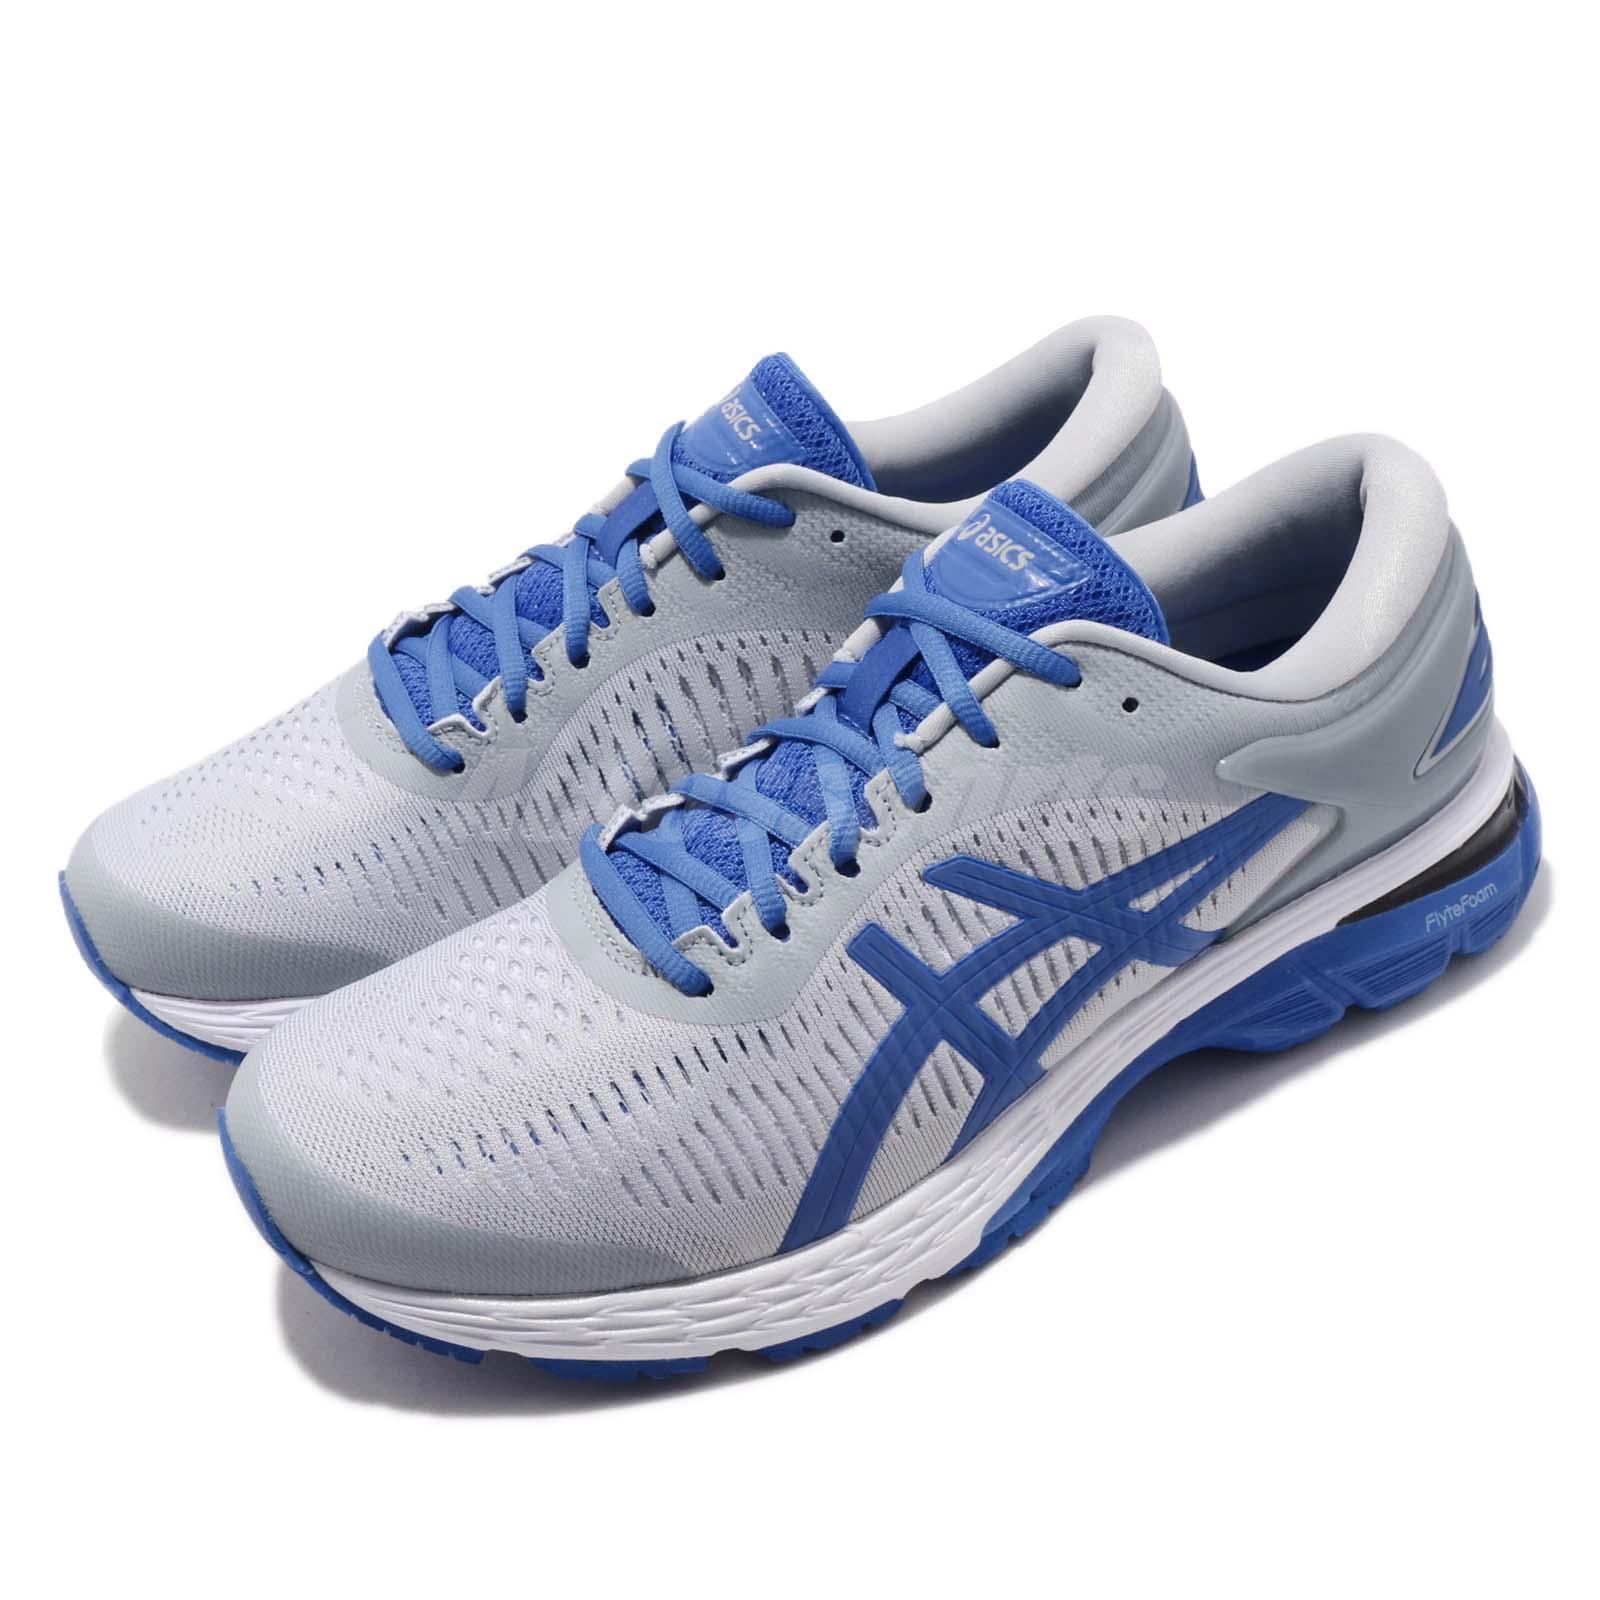 Asics Gel Kayano 25  Lite Show grigio blu Men Running scarpe scarpe da ginnastica 1011A204 -020  negozio outlet